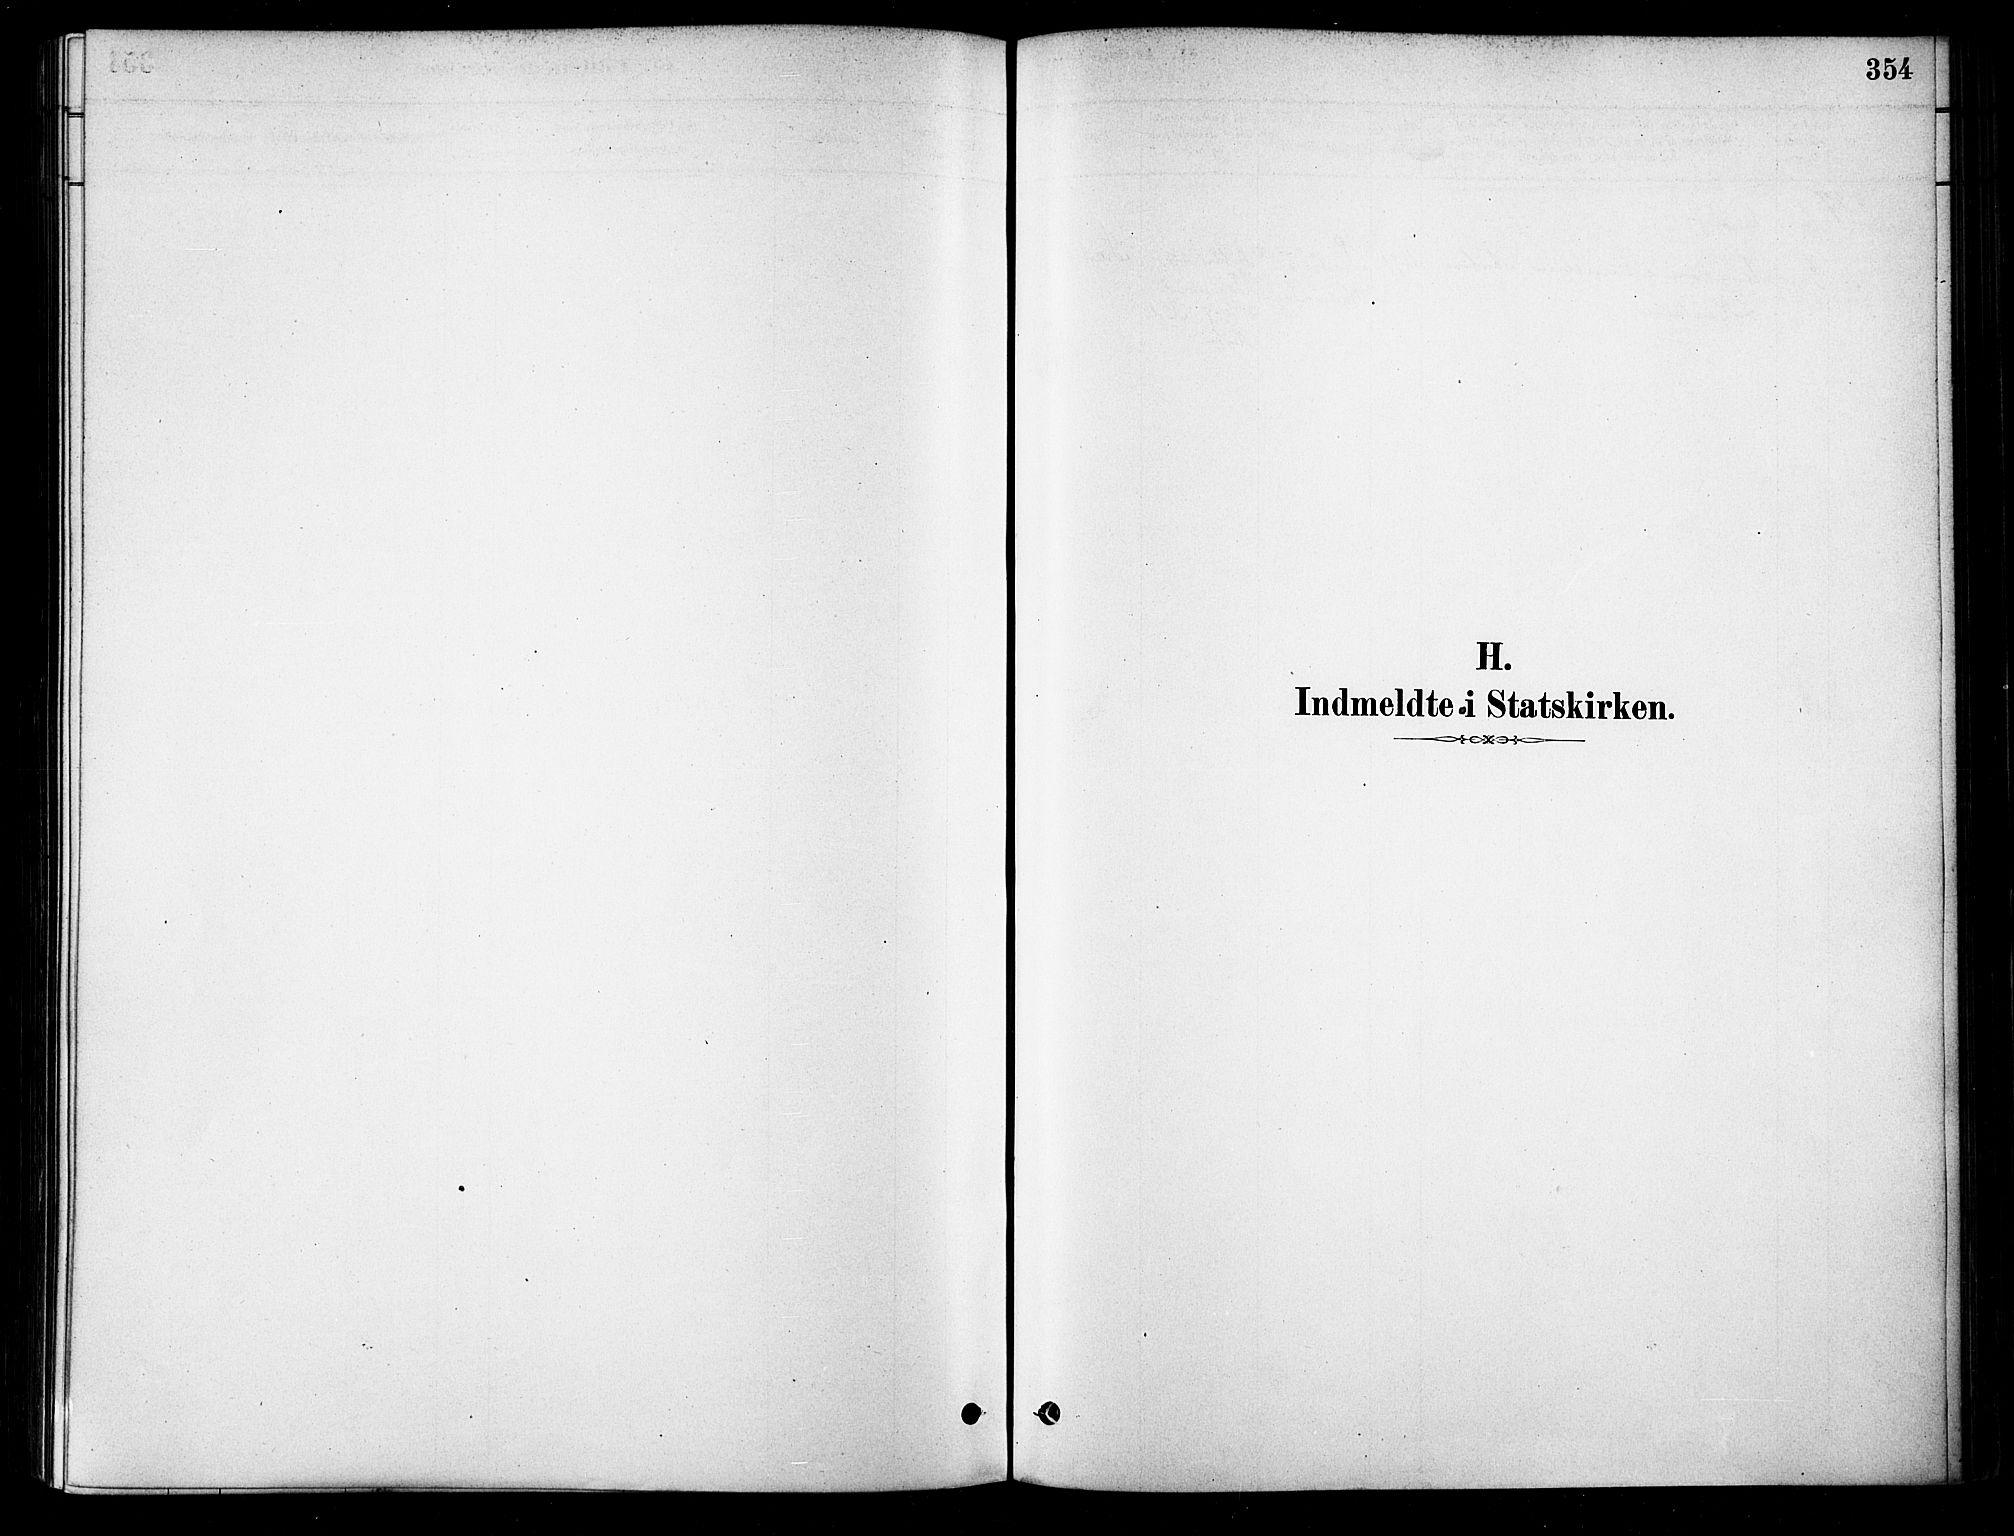 SATØ, Karlsøy sokneprestembete, H/Ha/Haa/L0006kirke: Ministerialbok nr. 6, 1879-1890, s. 354